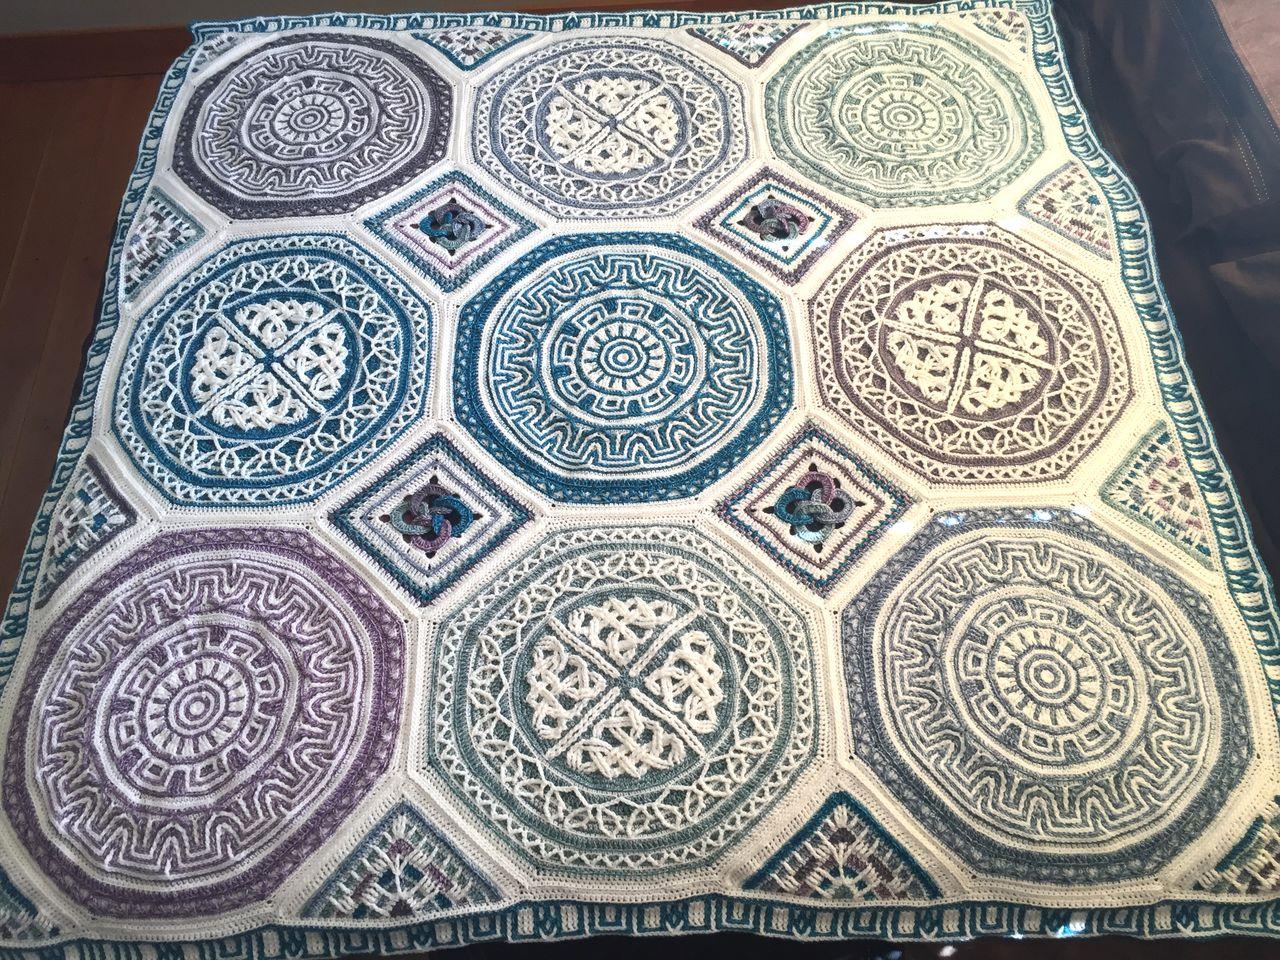 About Labyrinth Celtic mandala blanket | LillaBjörn\'s Crochet World